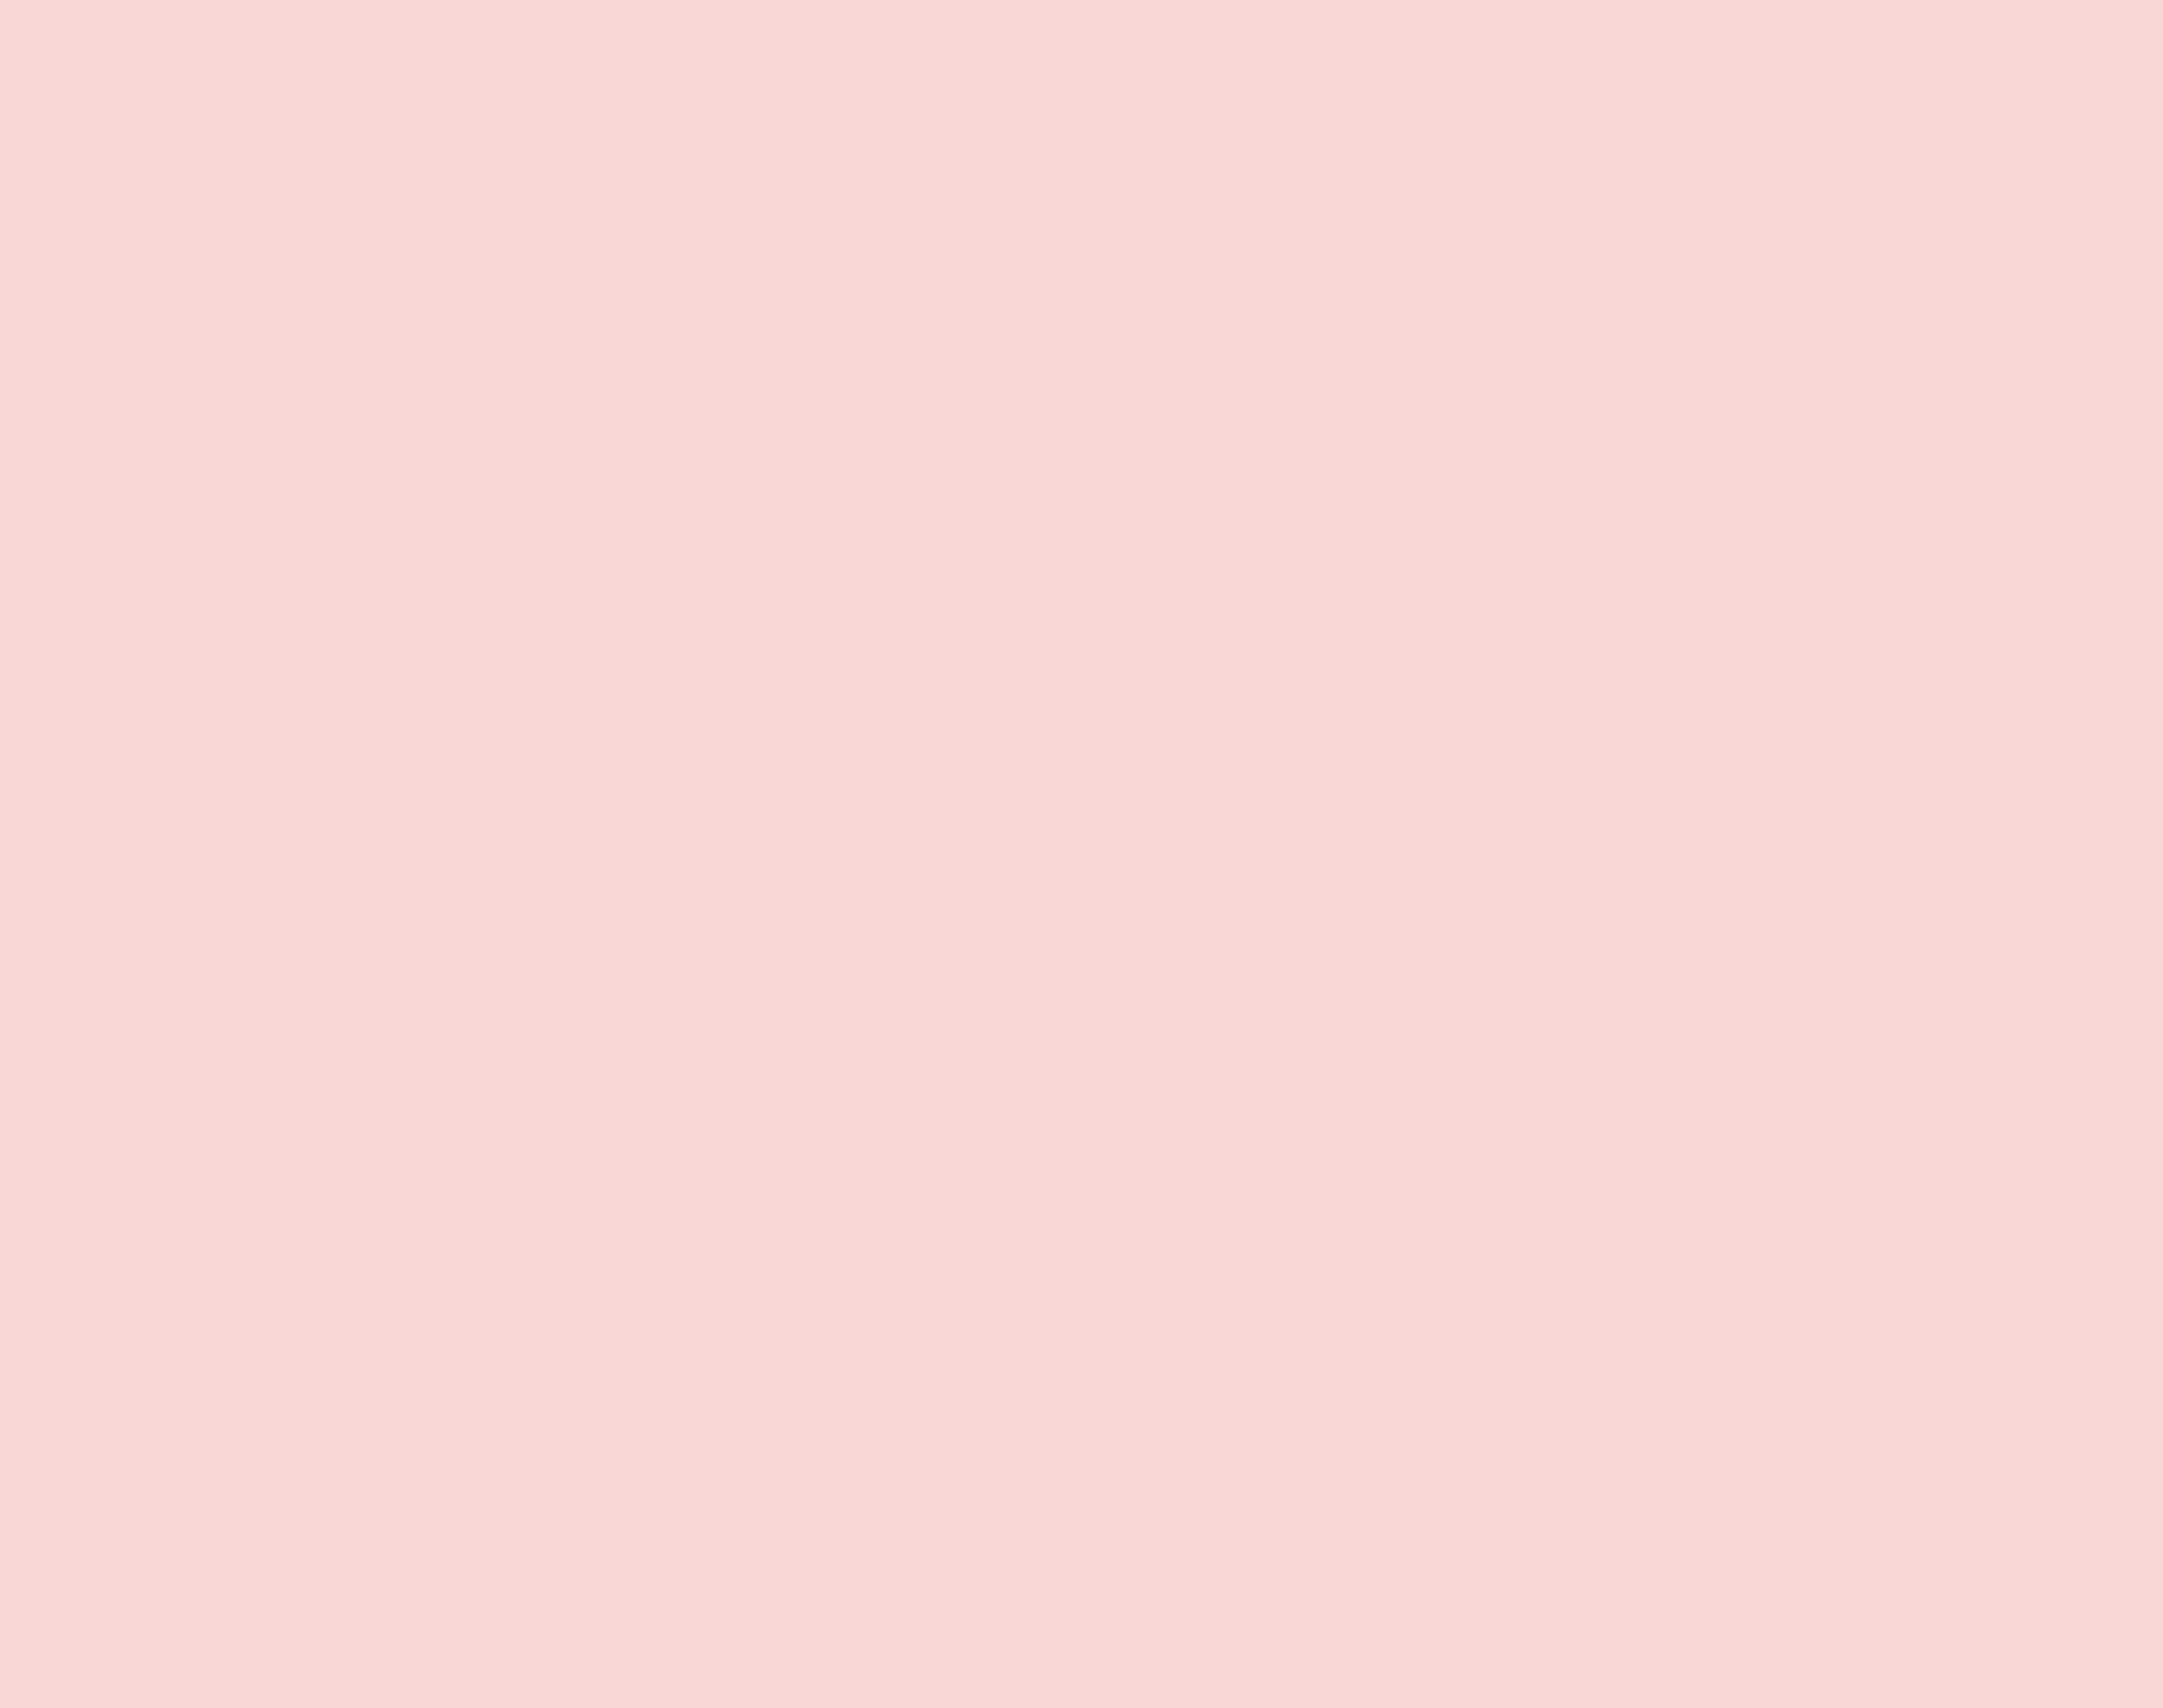 Rosa Quarzo Colore Pantone 2016